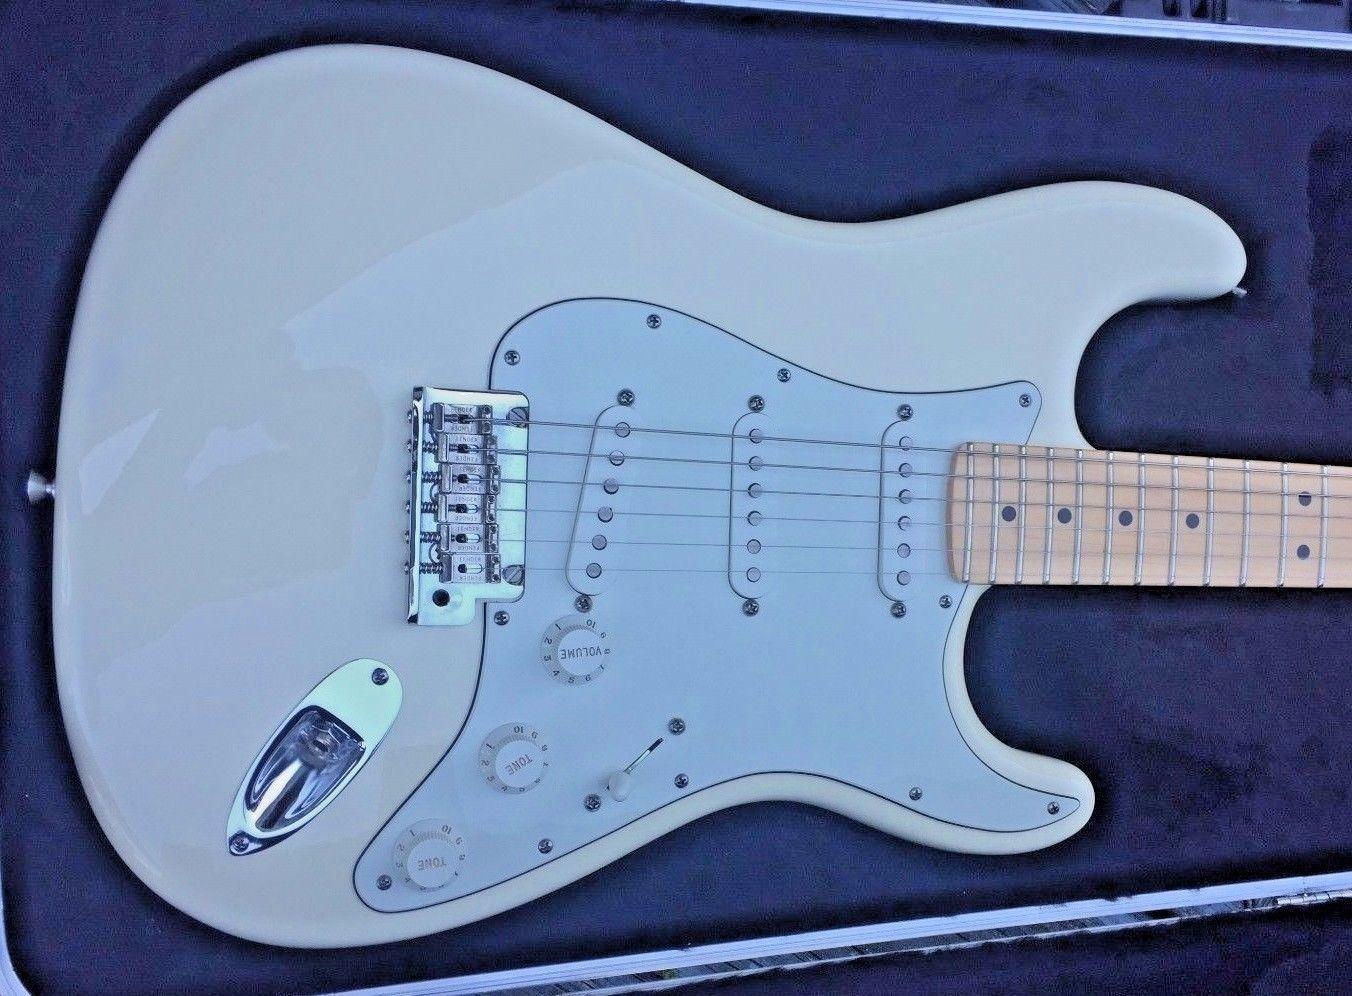 USA Fender 2009 American Standard Stratocaster Guitar White   Guitar ...